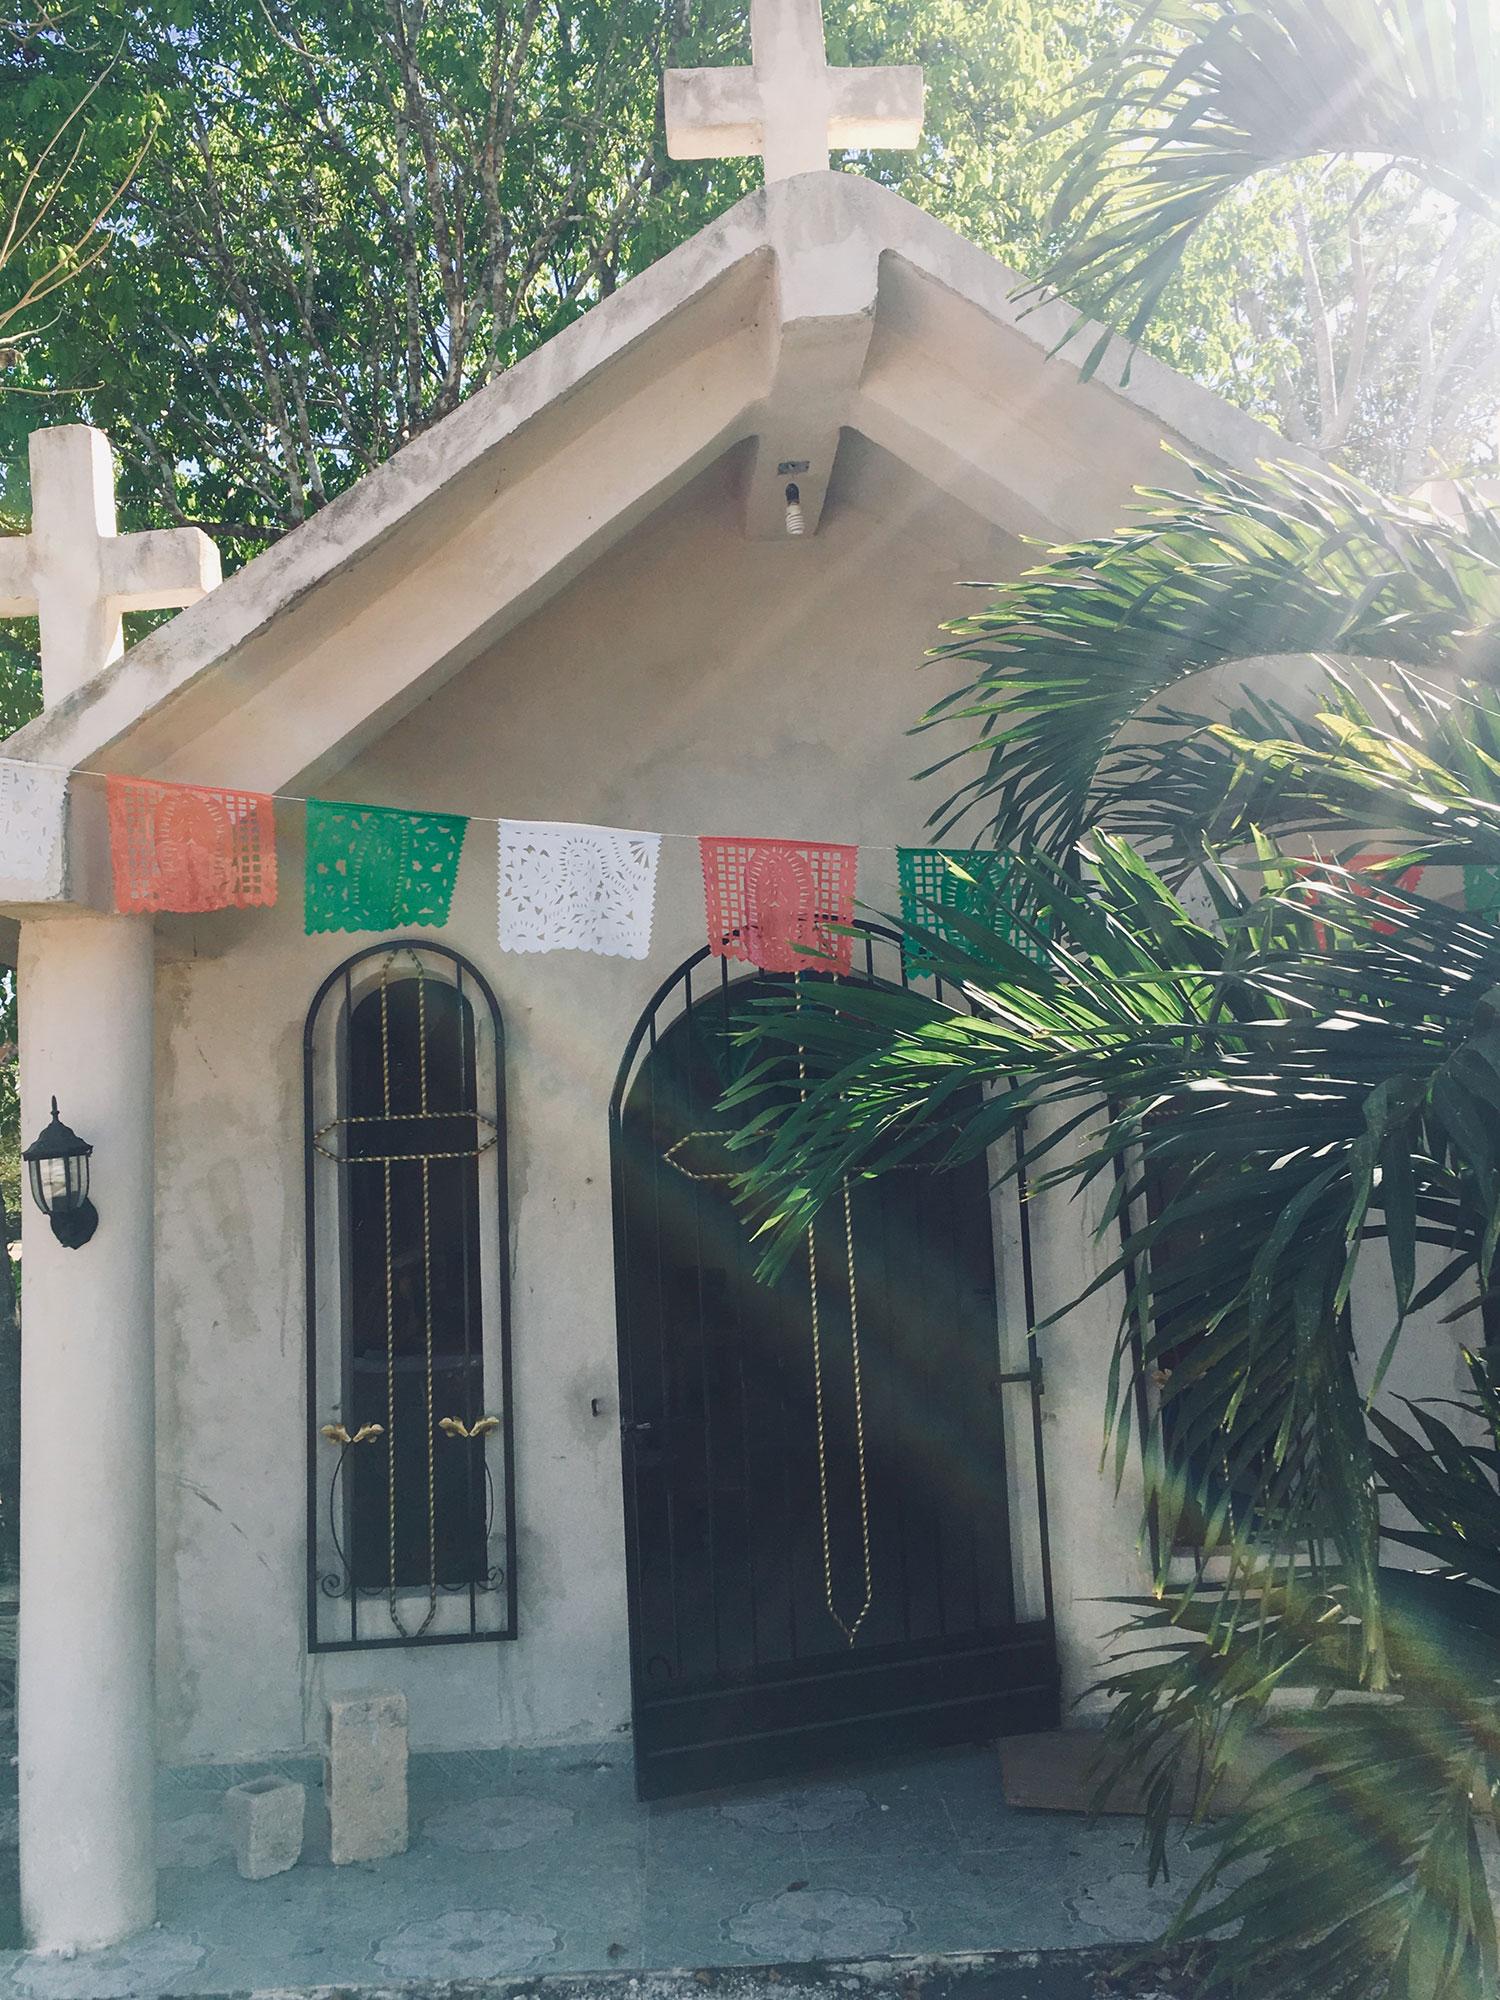 The church at Punta Laguna serving Campamento Hidalgo village.